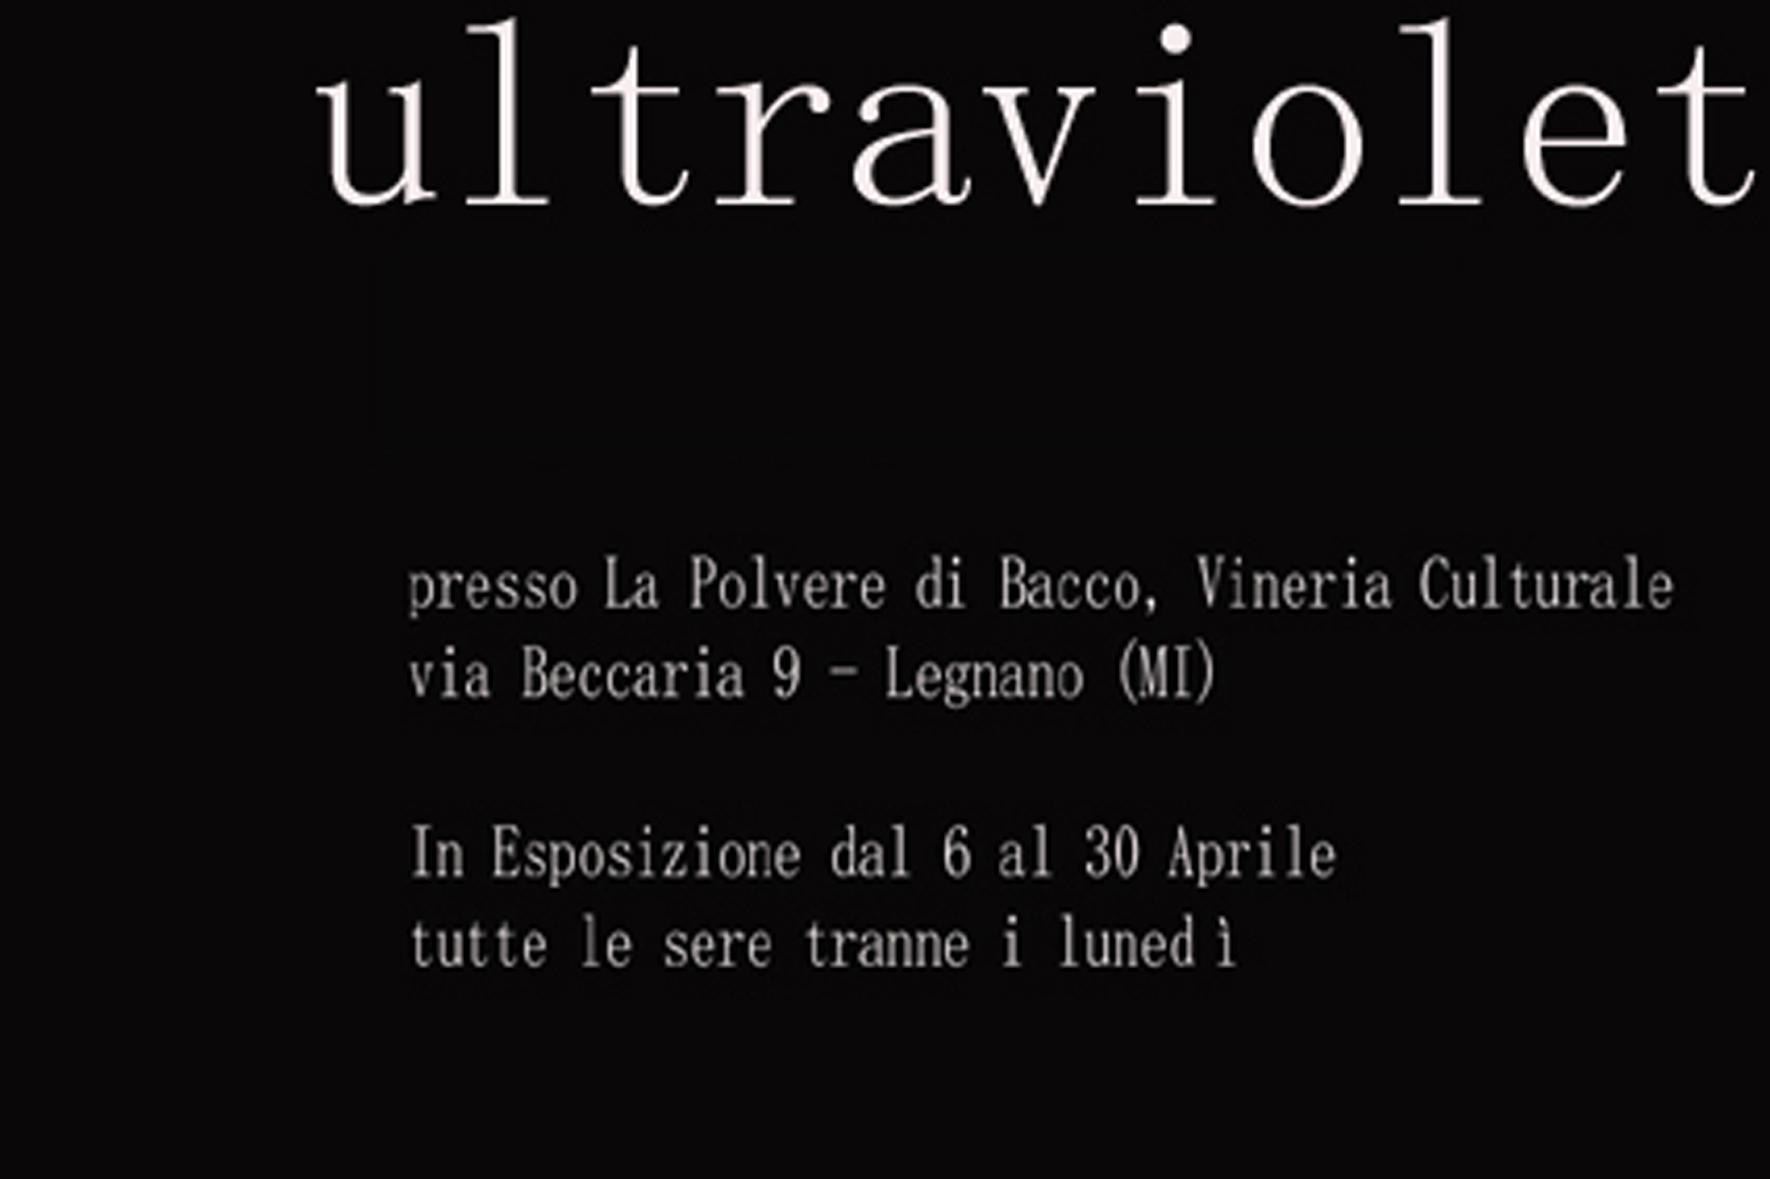 Ultraviolet_10x15 RETRO